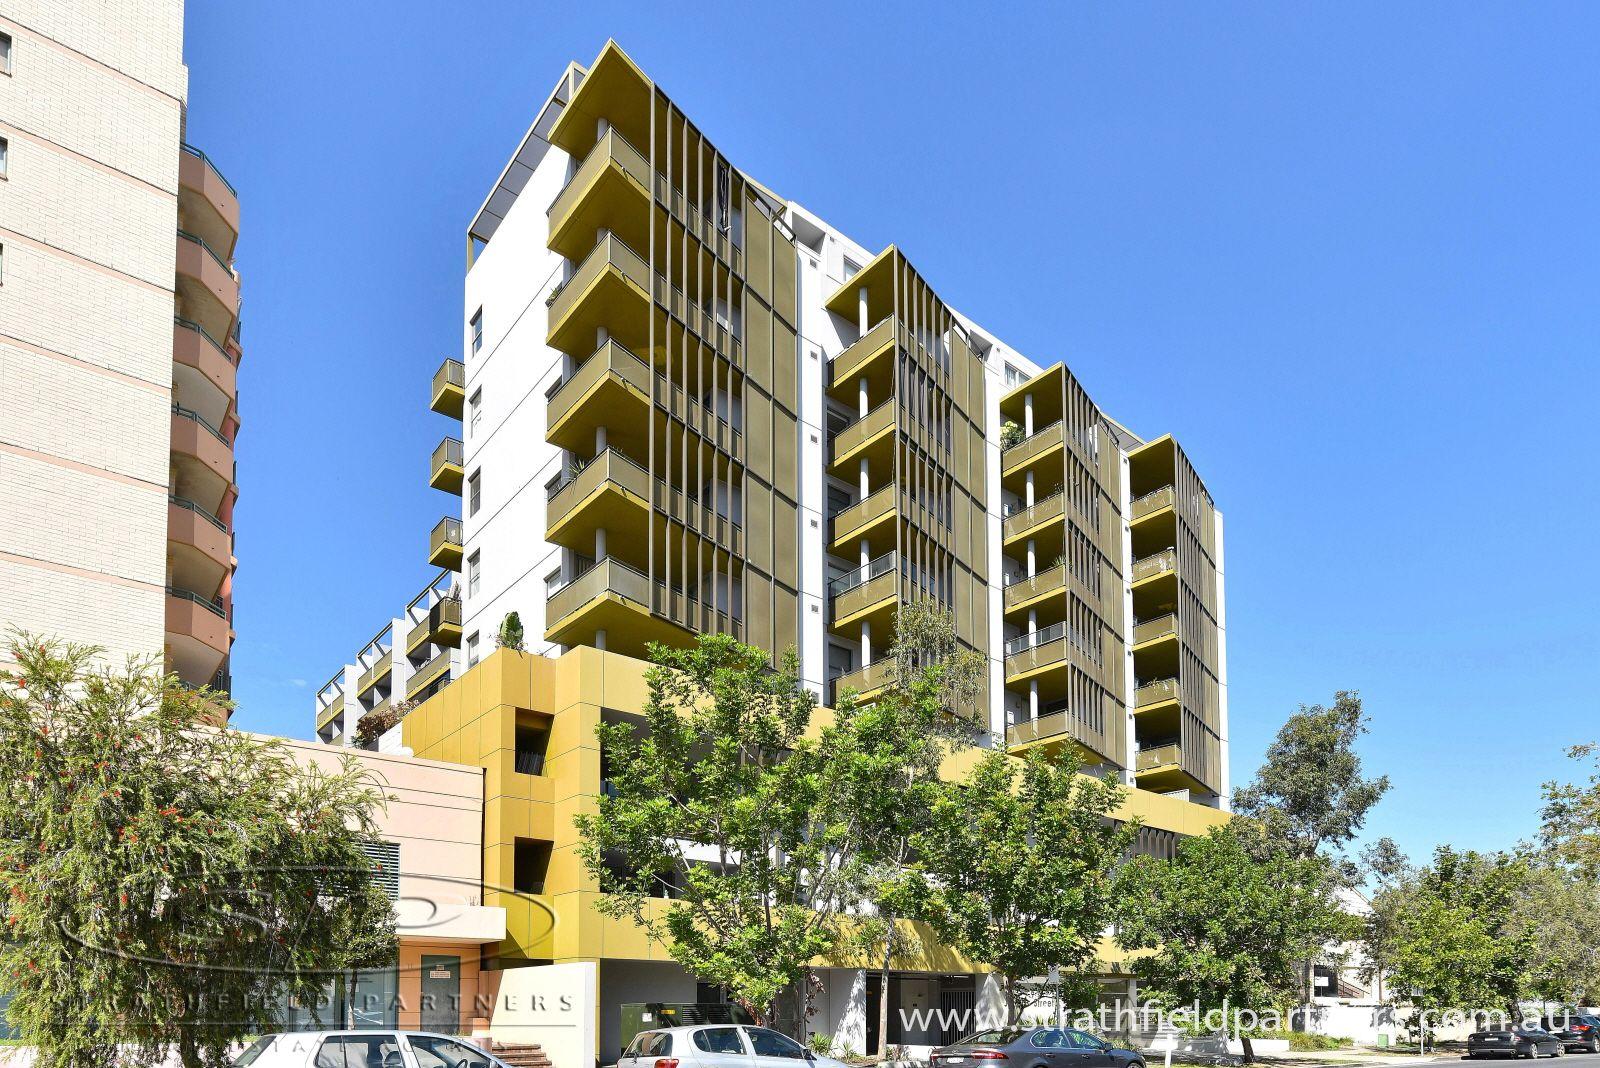 1A/7 Jacobs Street, Bankstown NSW 2200, Image 0